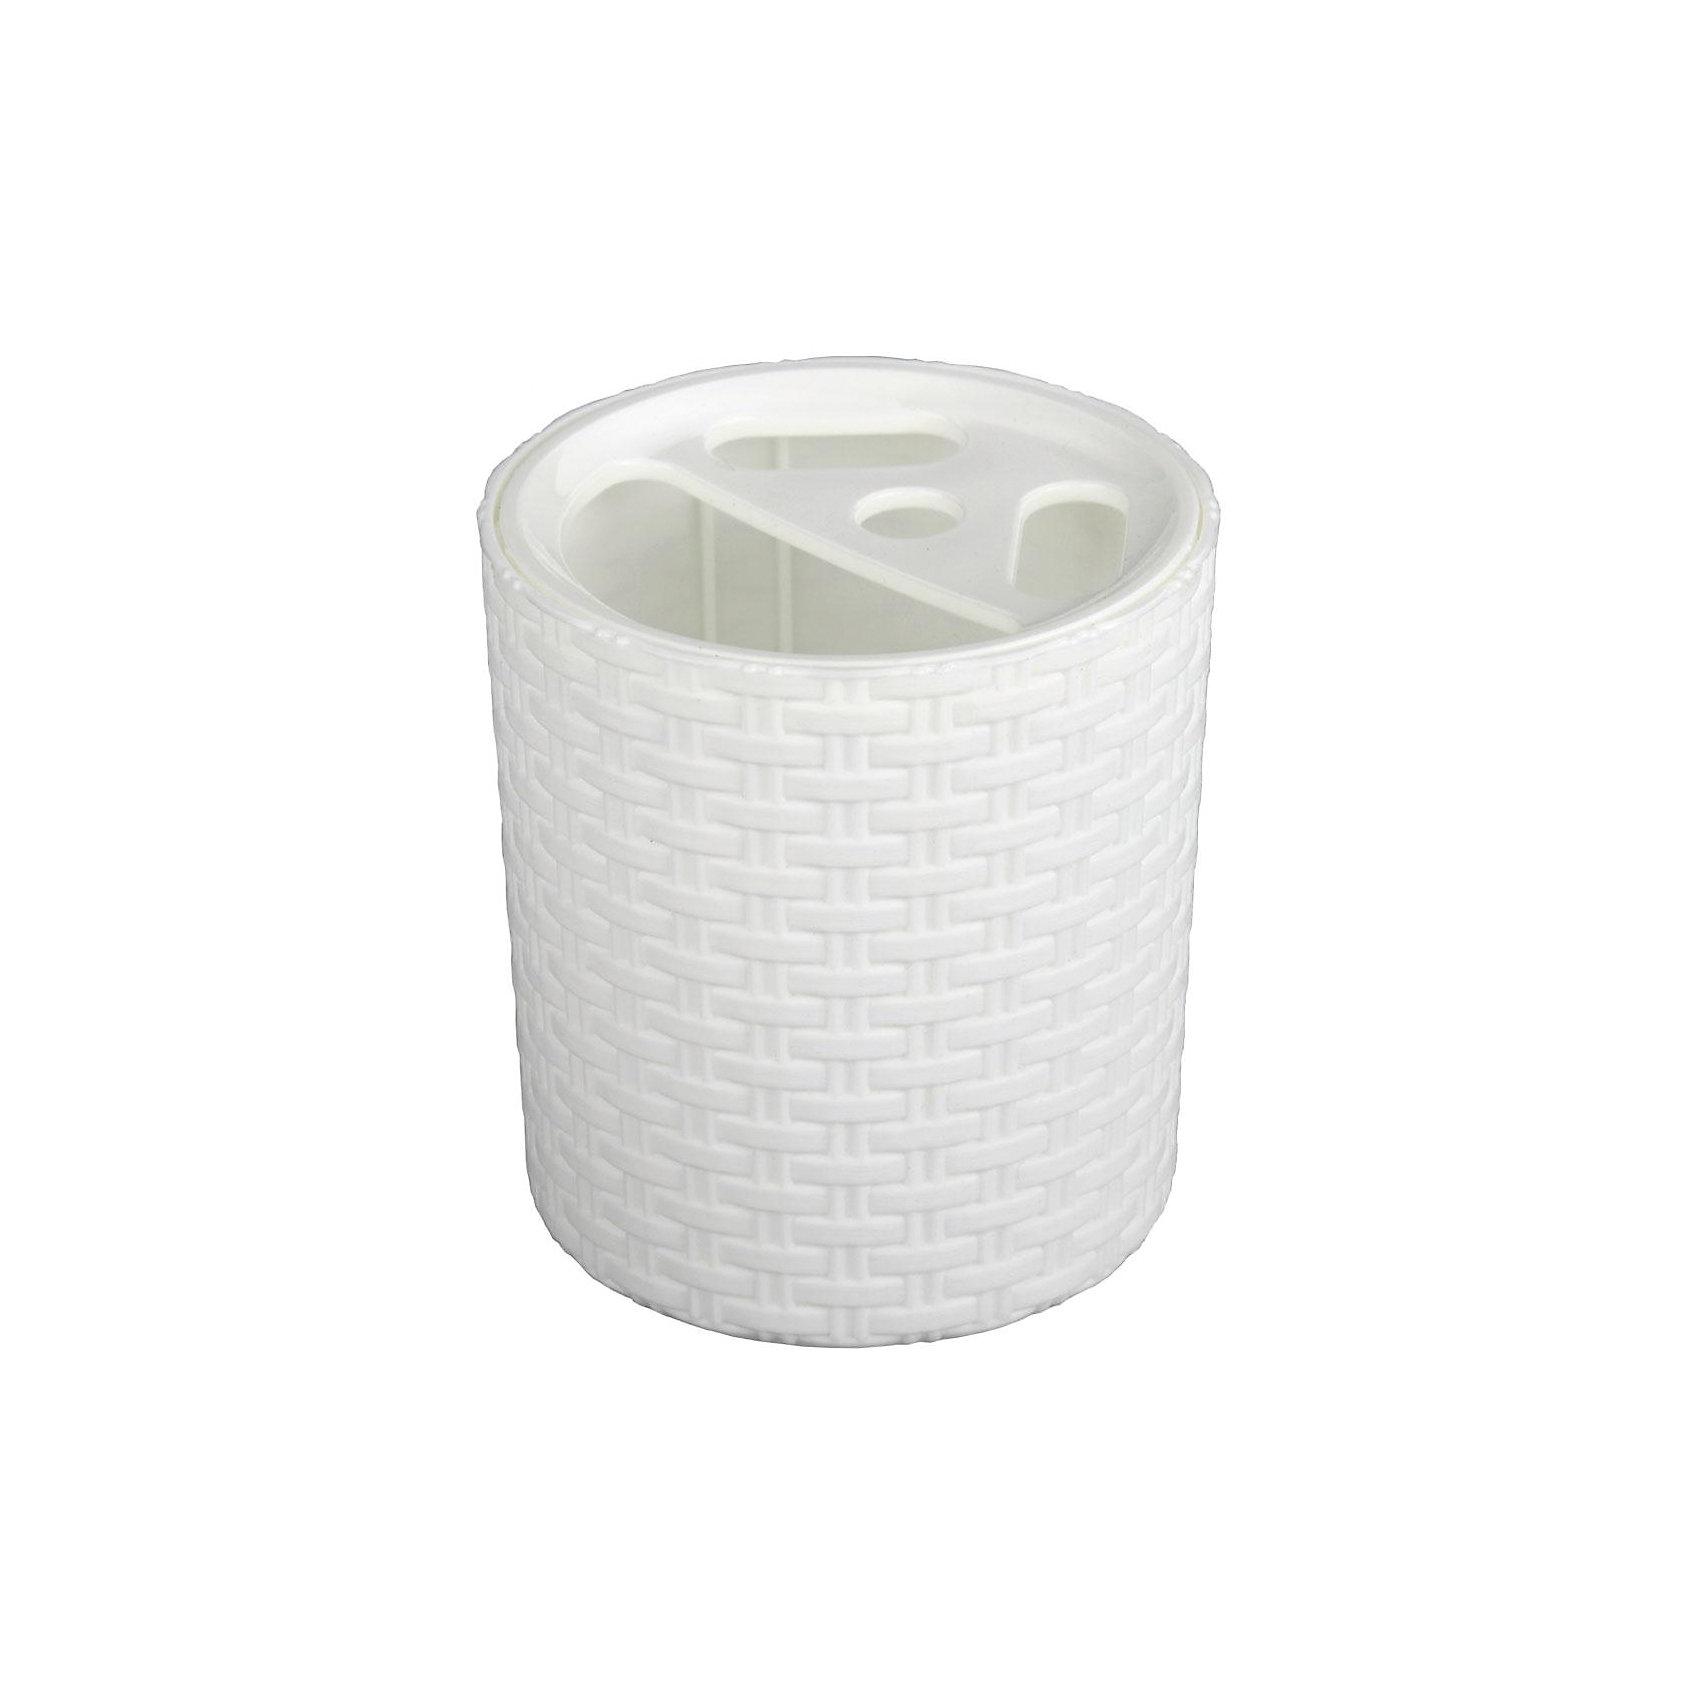 Alternativa Подставка Плетёнка для зубных щёток, Alternativa, белый trio стакан для зубных щёток